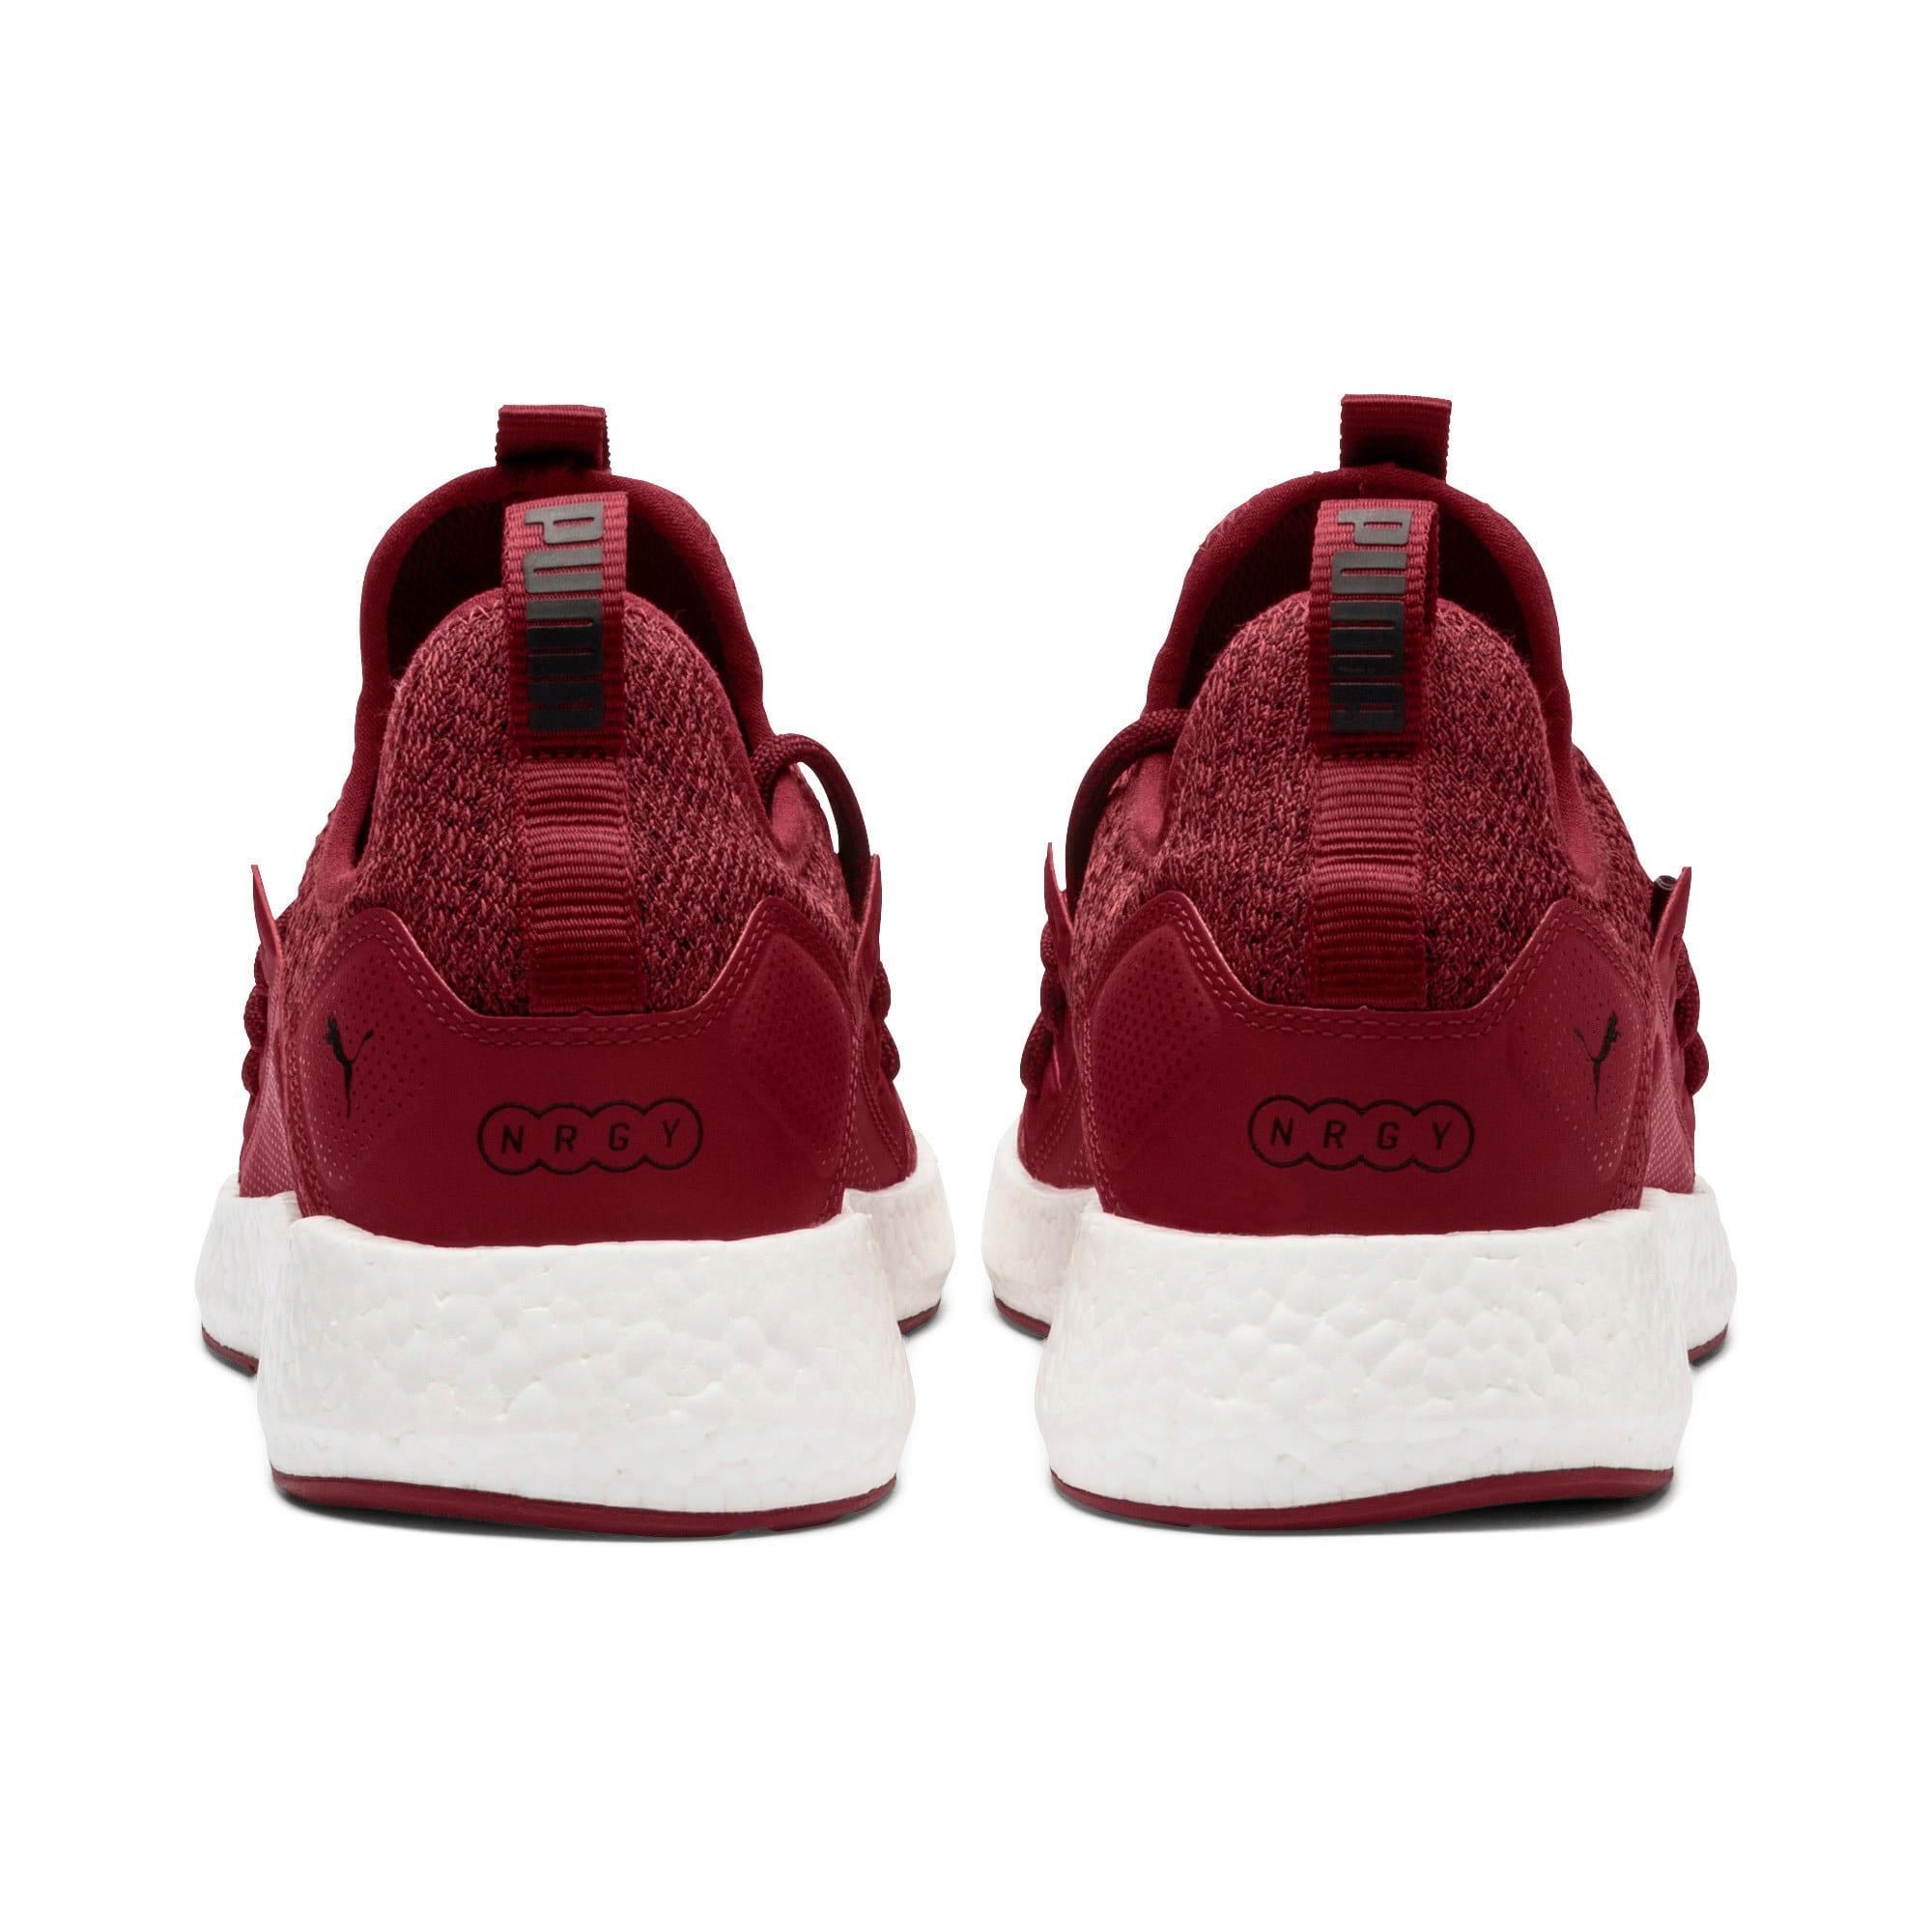 Thumbnail 4 of NRGY Neko Knit Men's Running Shoes, Pomegranate-Puma Black, medium